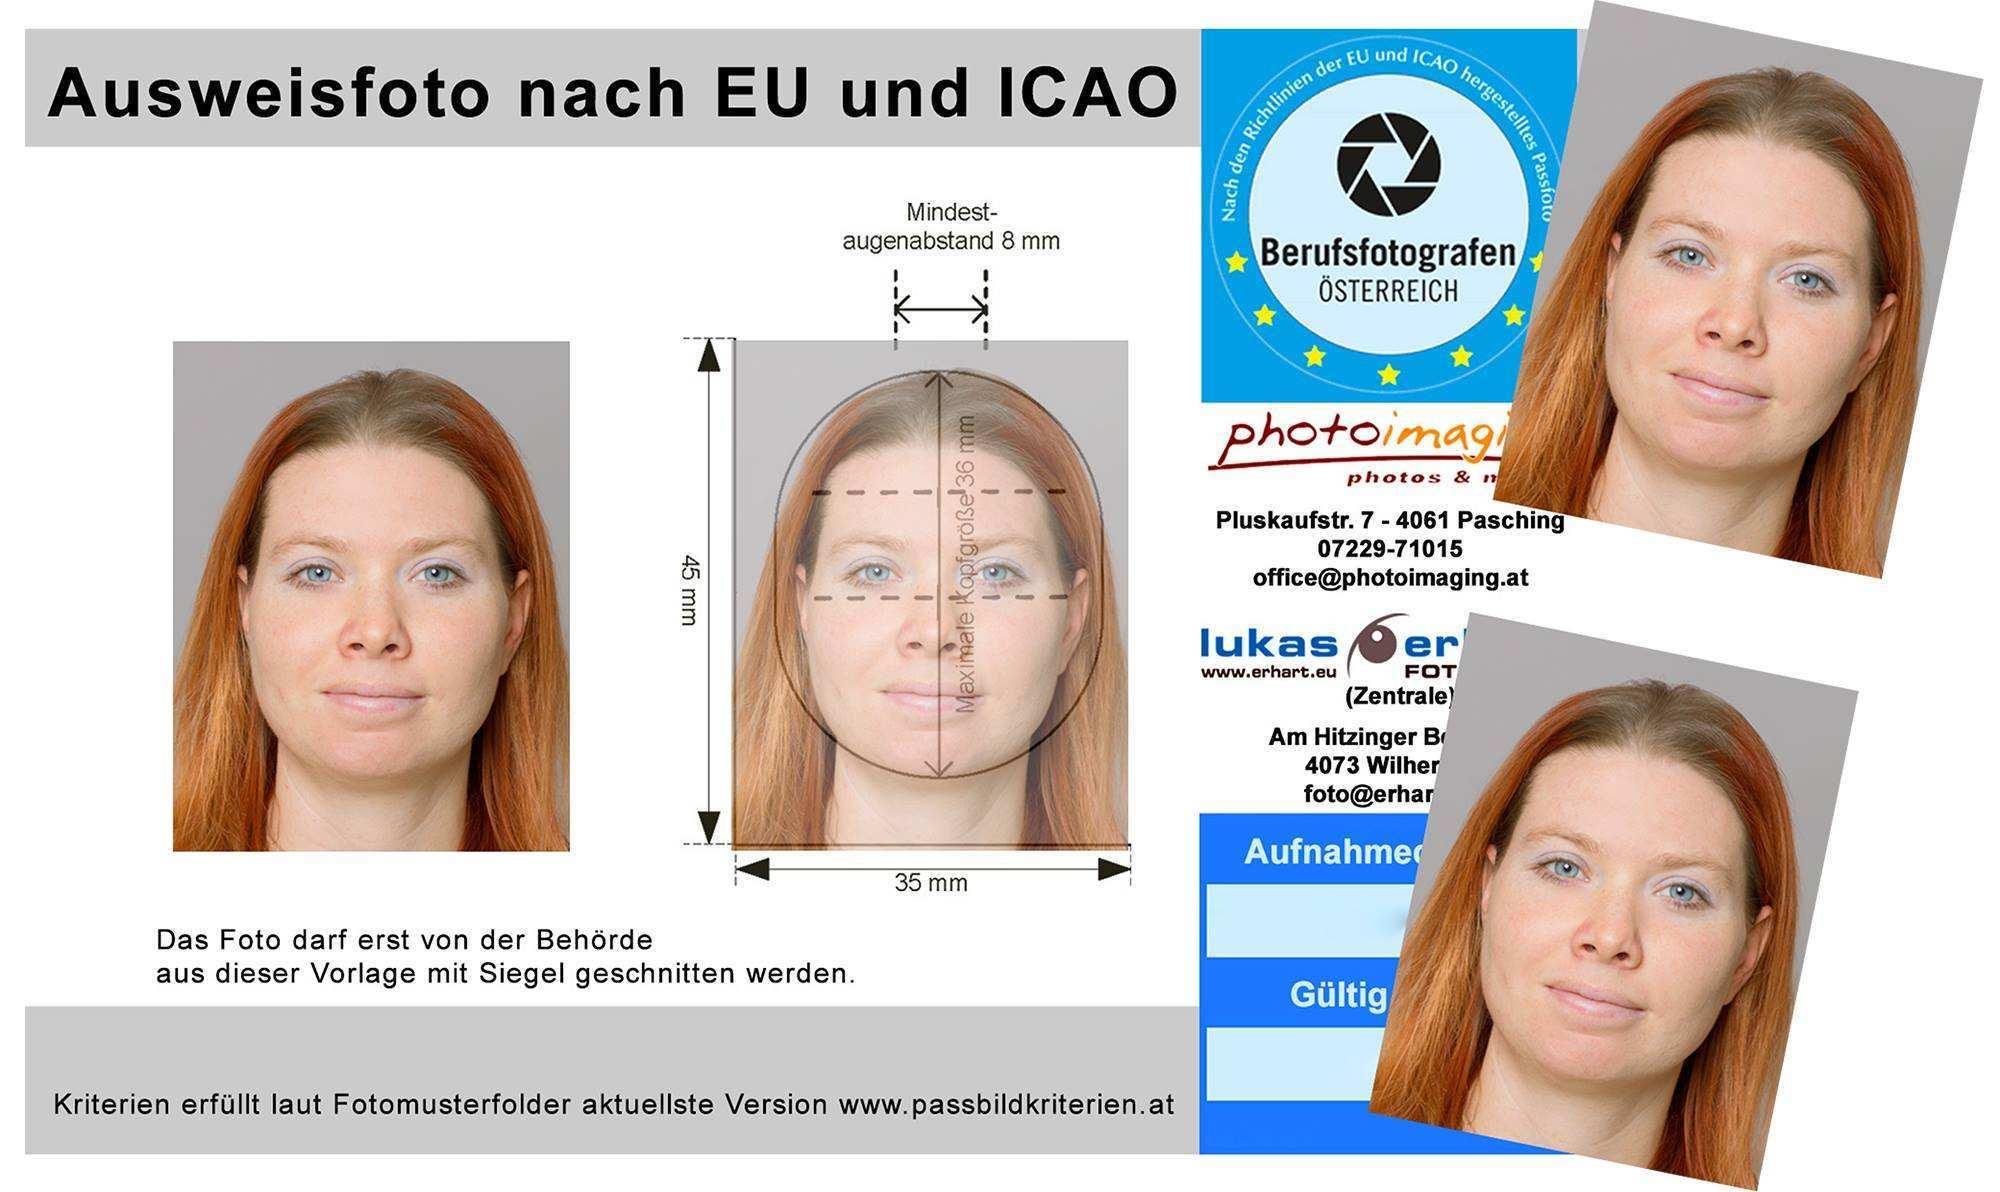 Biometrisches Passfoto Passbilder Nach Eu Norm In Pasching Bei Photoimaging